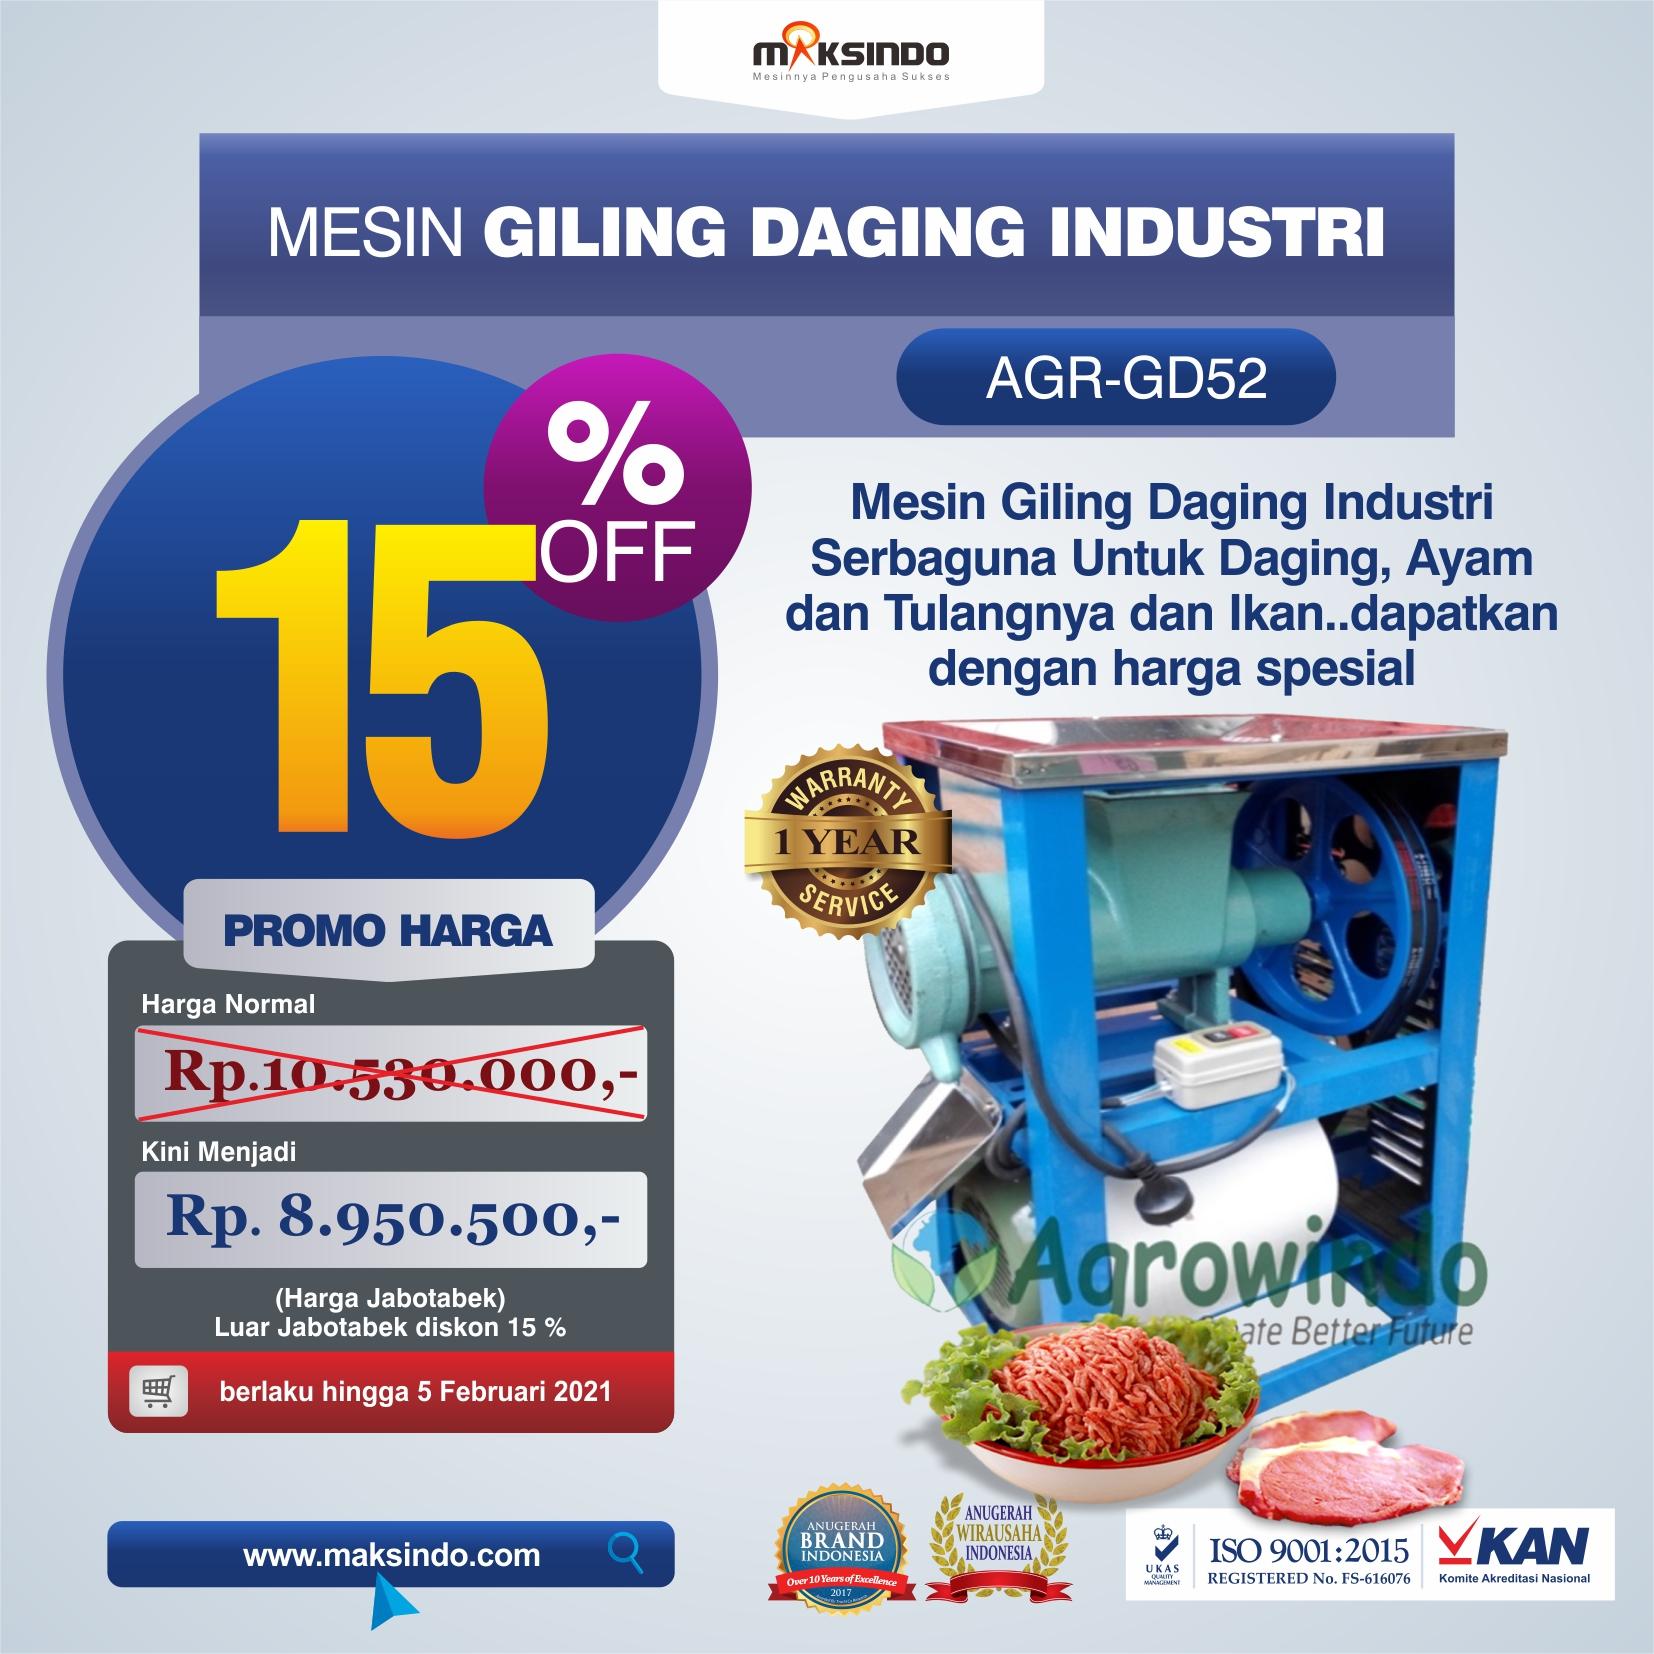 Mesin Giling Daging Industri (AGR-GD52)